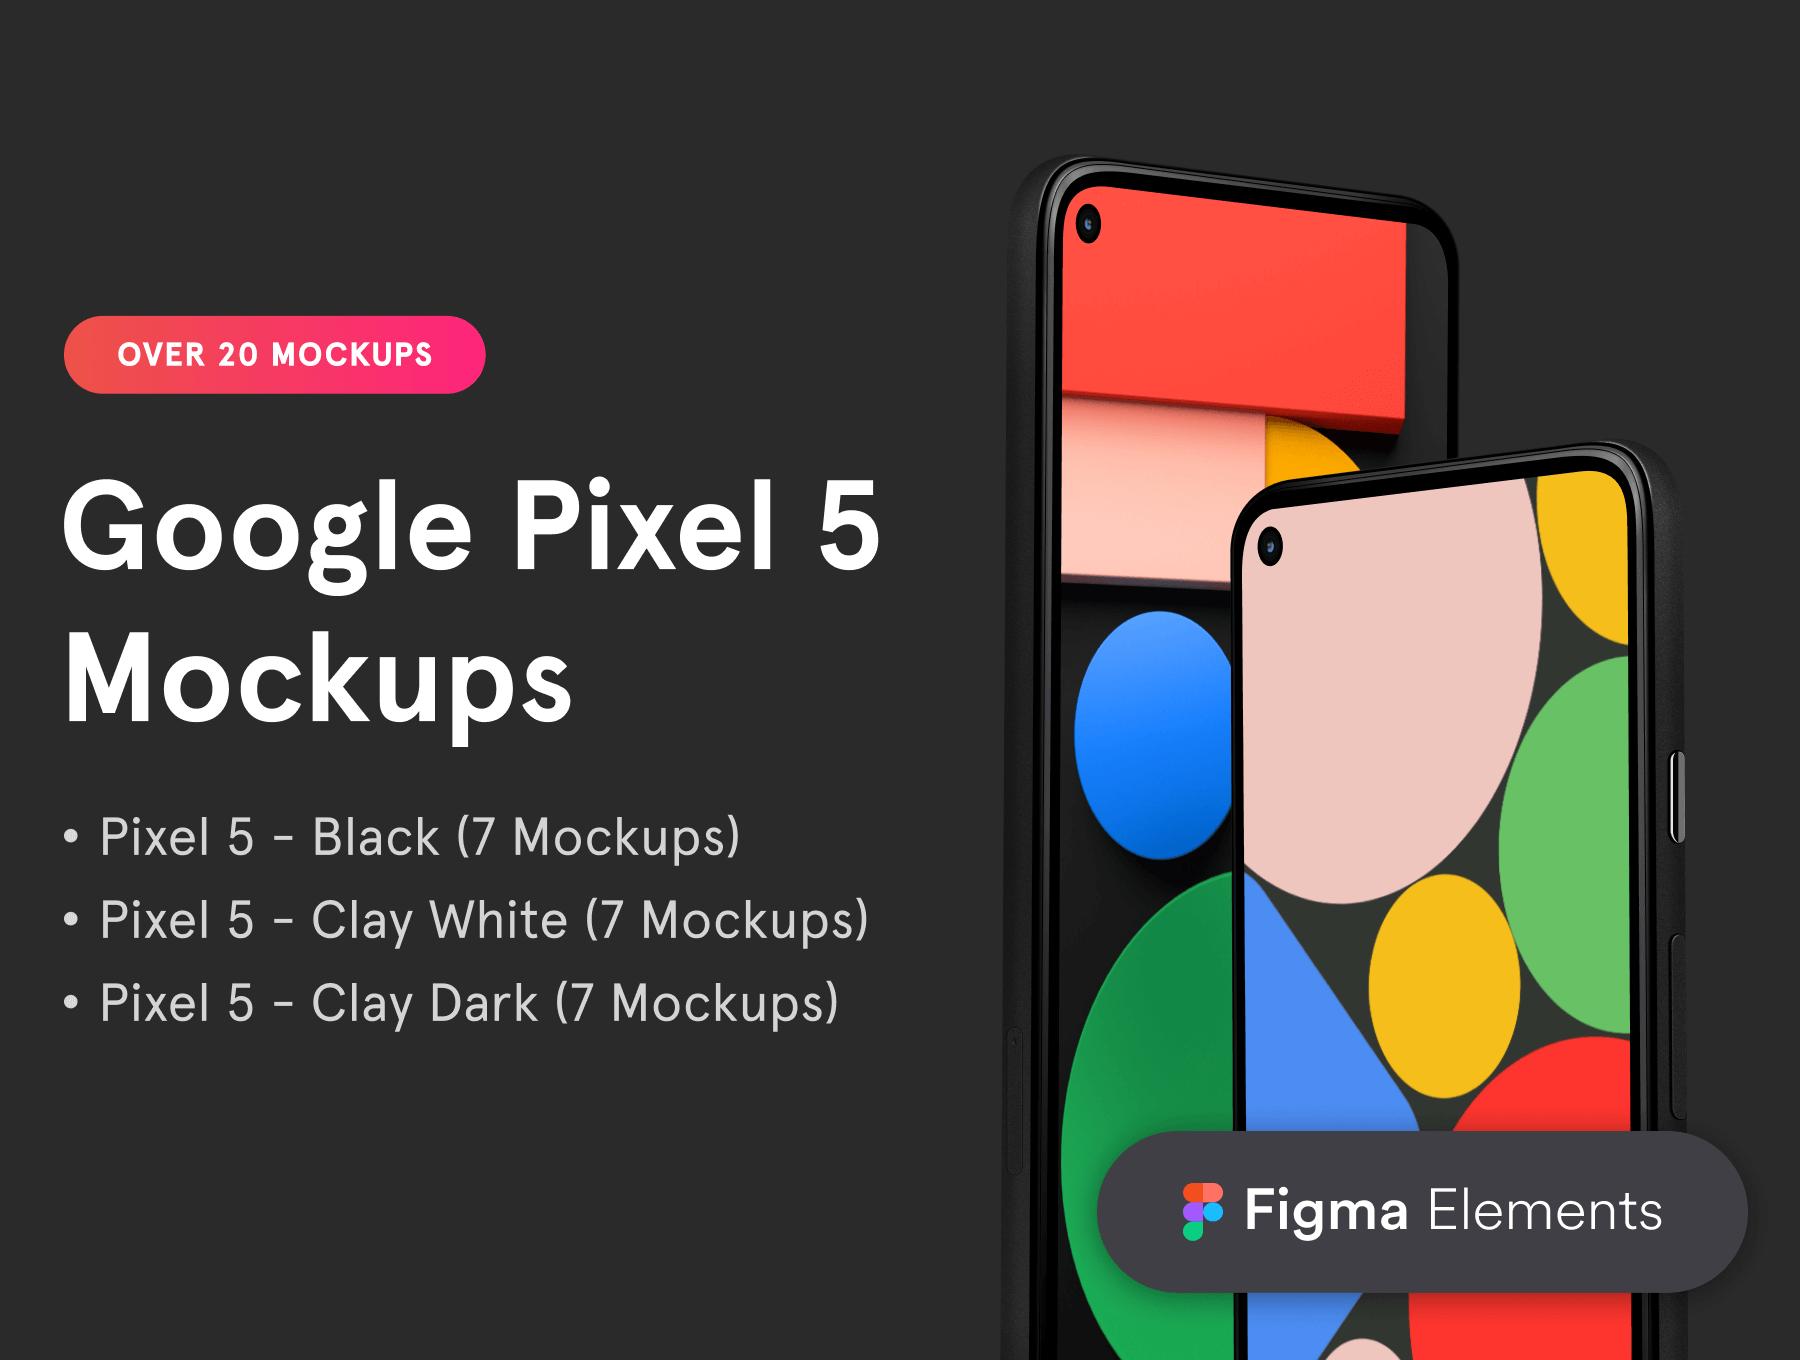 Google Pixel 5 Figma Mockups